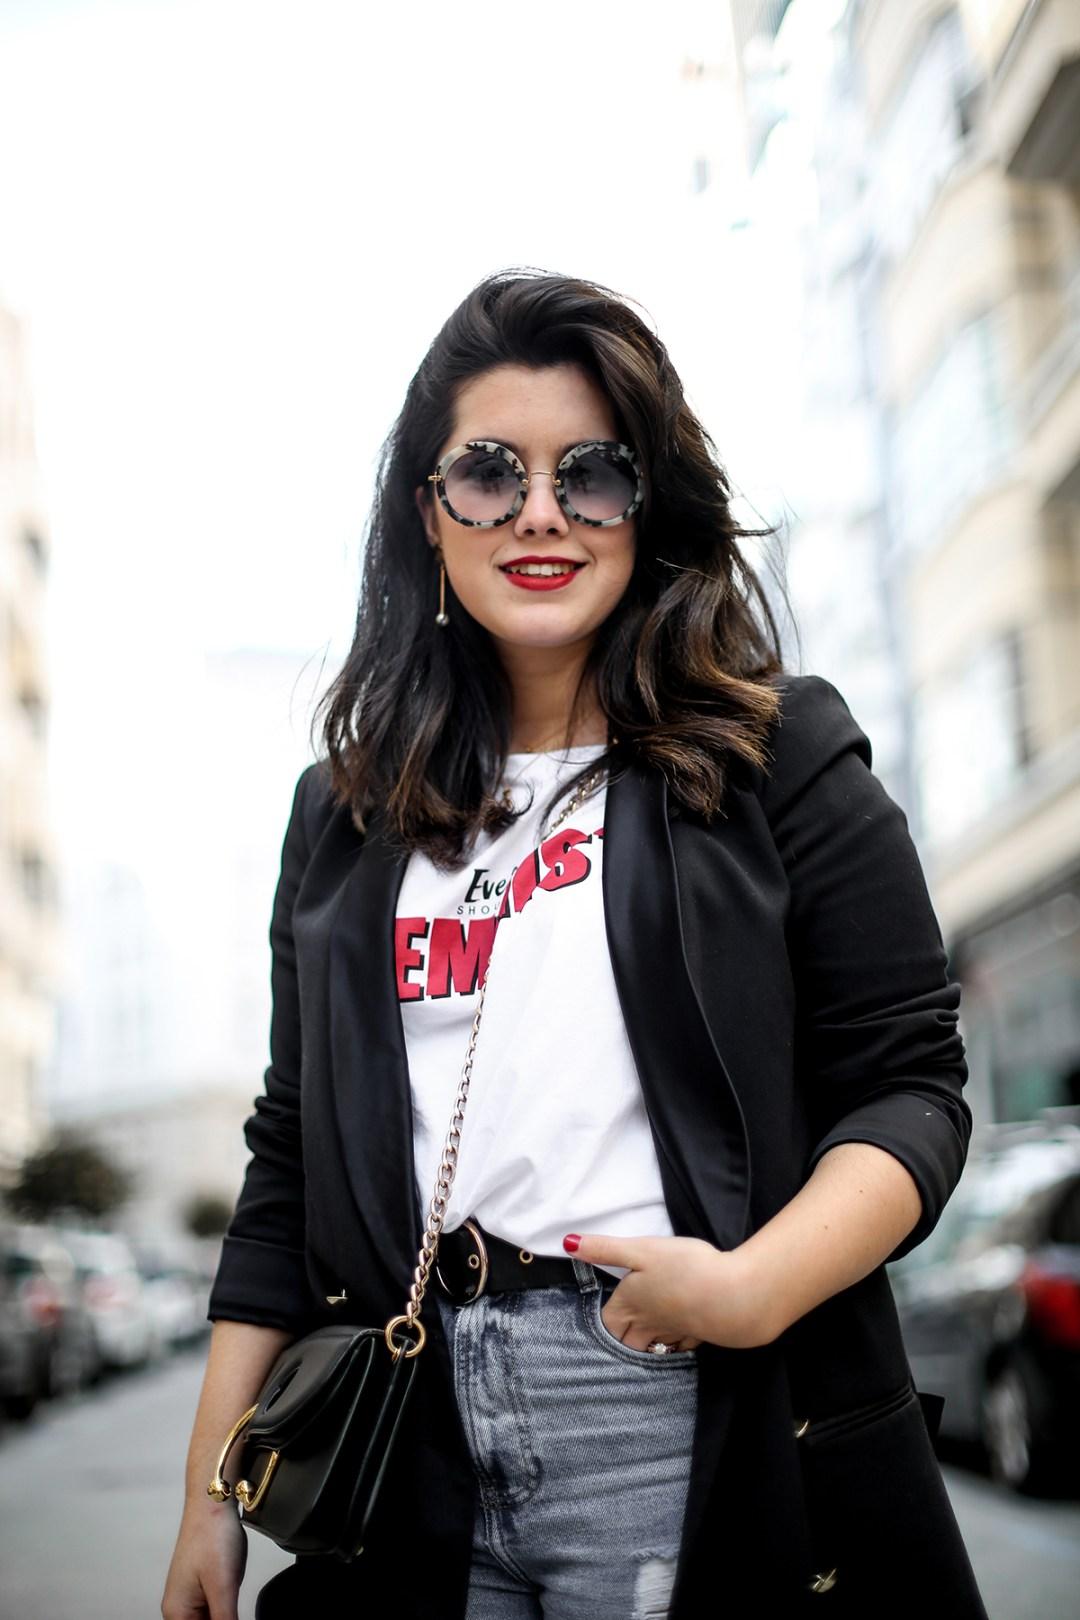 camiseta-feminista-stradivarius-moda-tendencia-jwanderson-myblueberrynightsblog9